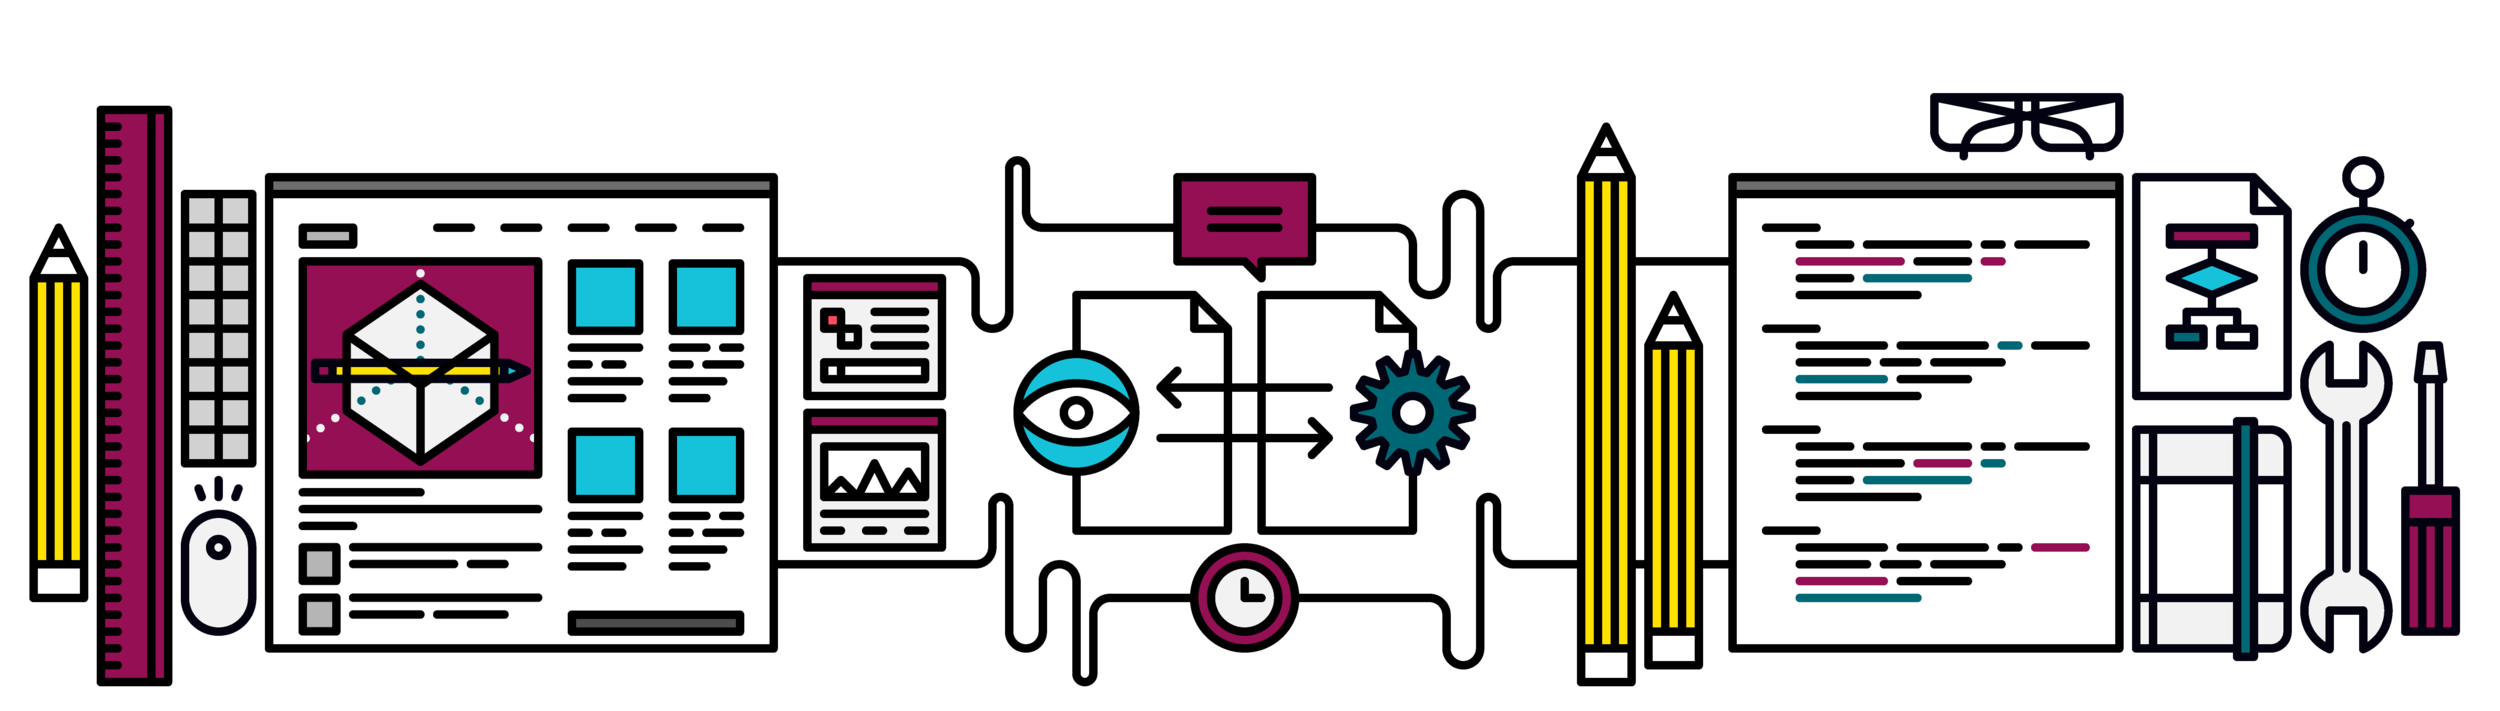 prozess-banner_prototyp.jpg